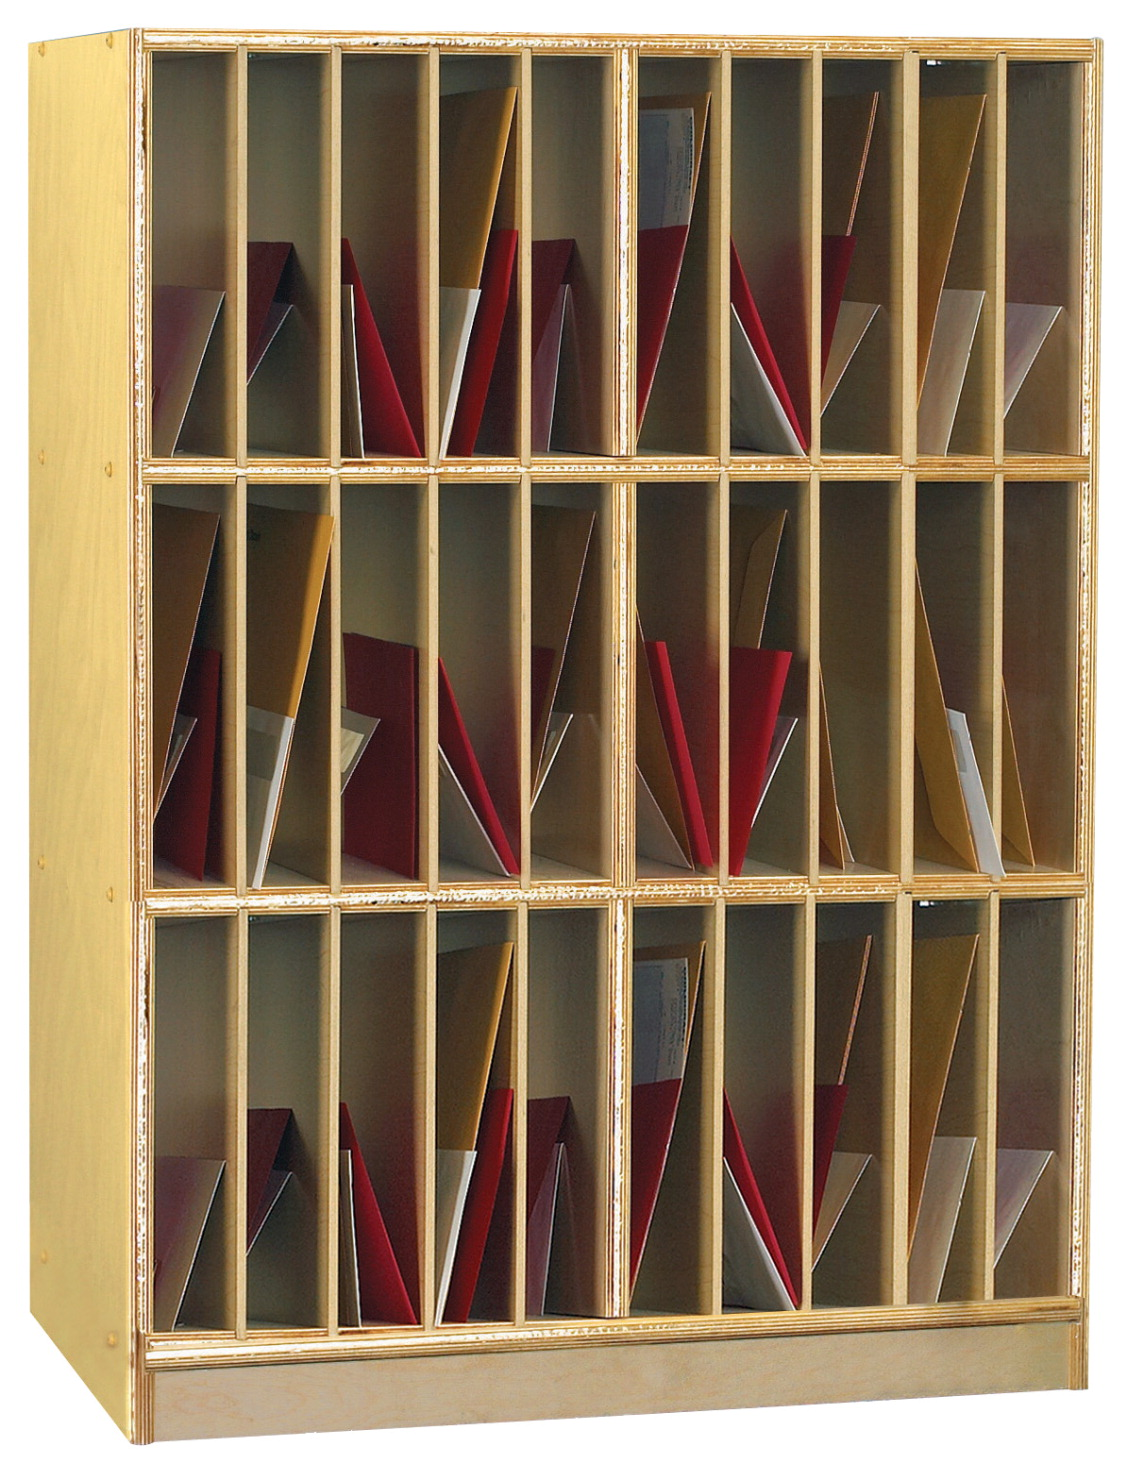 Childcraft Vertical Mailbox Unit 30 Compartments School